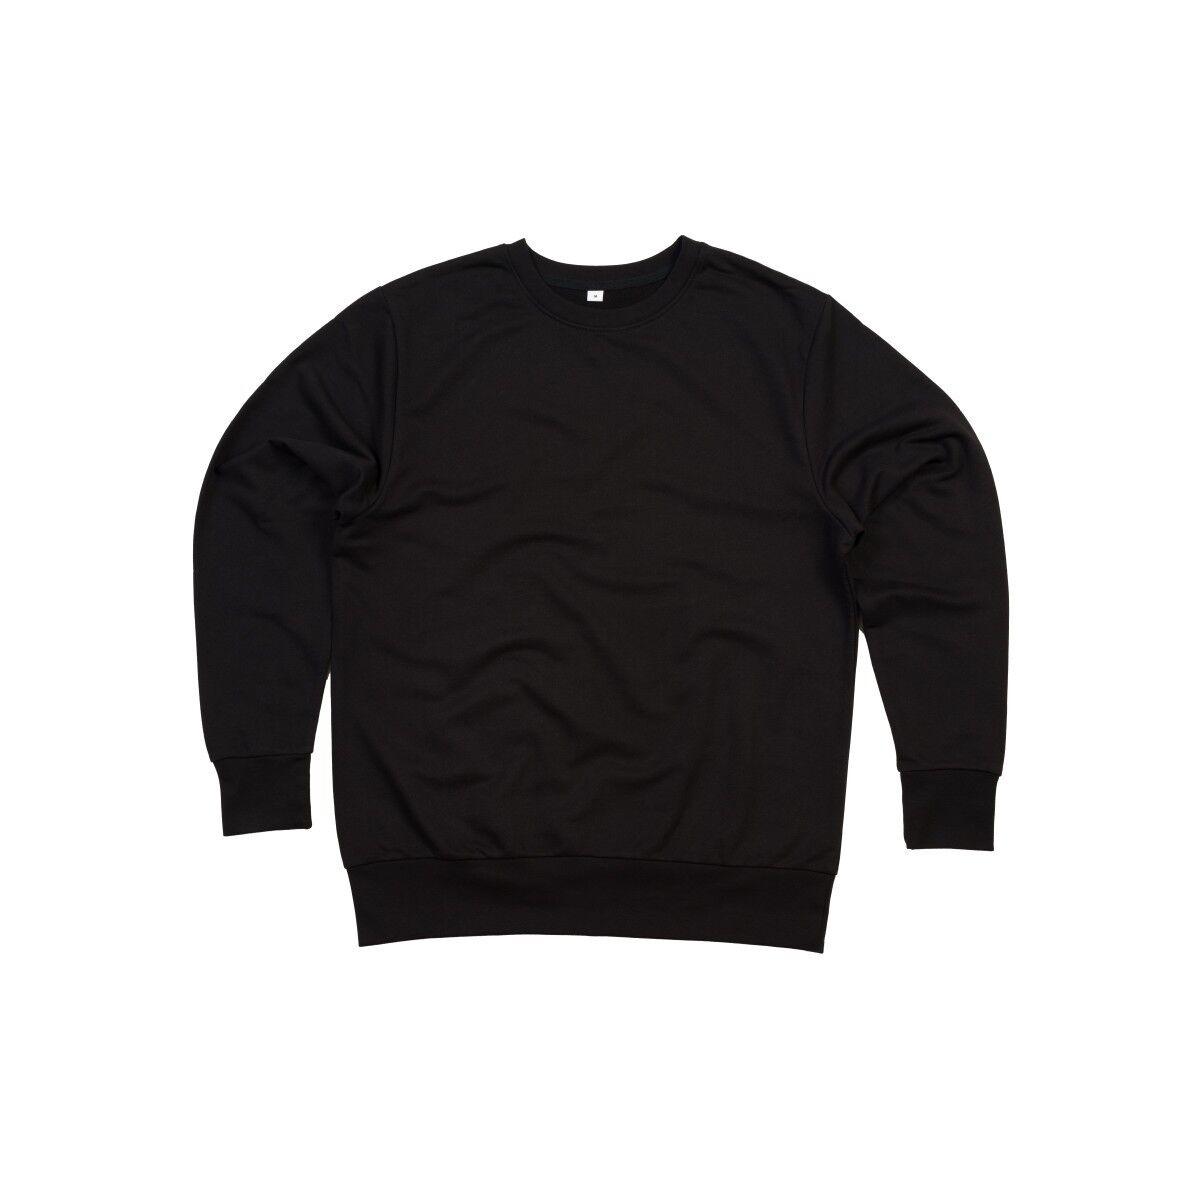 Unisex Mantis Sweatshirt - Black